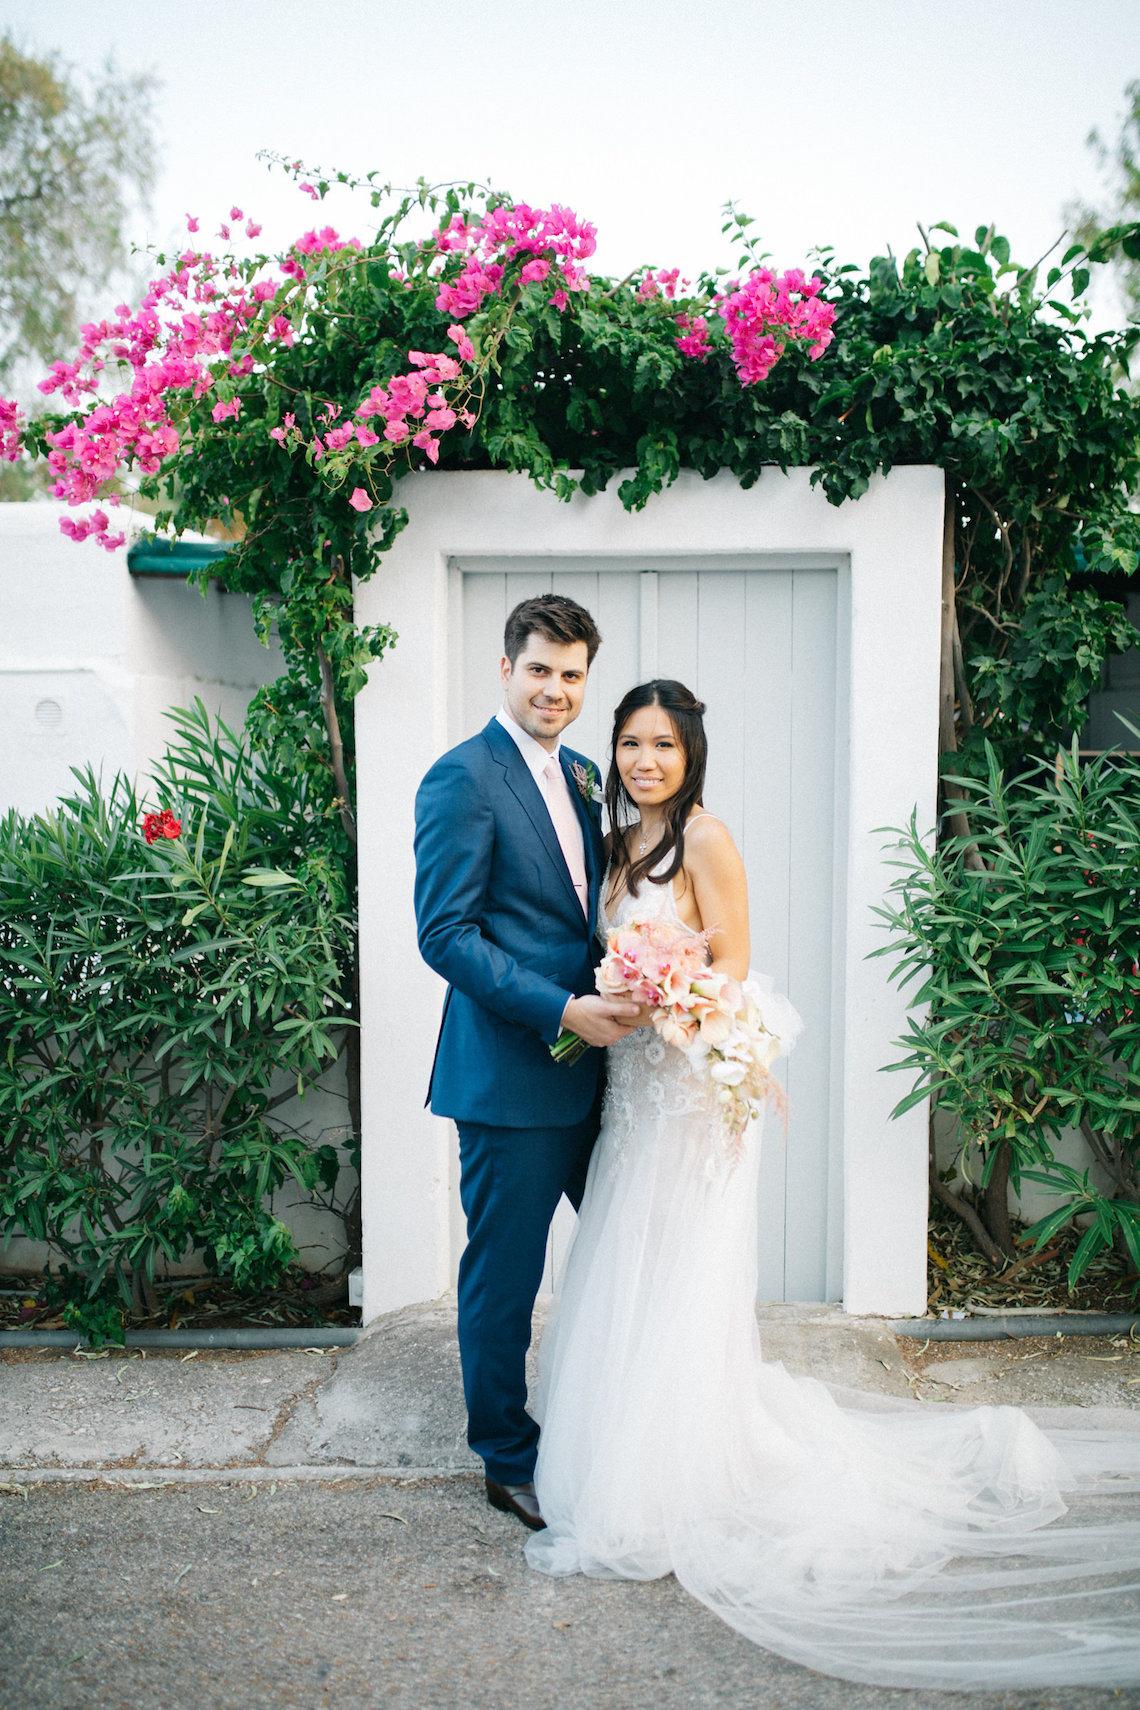 Multicultural Destination Wedding In Greece | Sotiris Tsakanikas 29